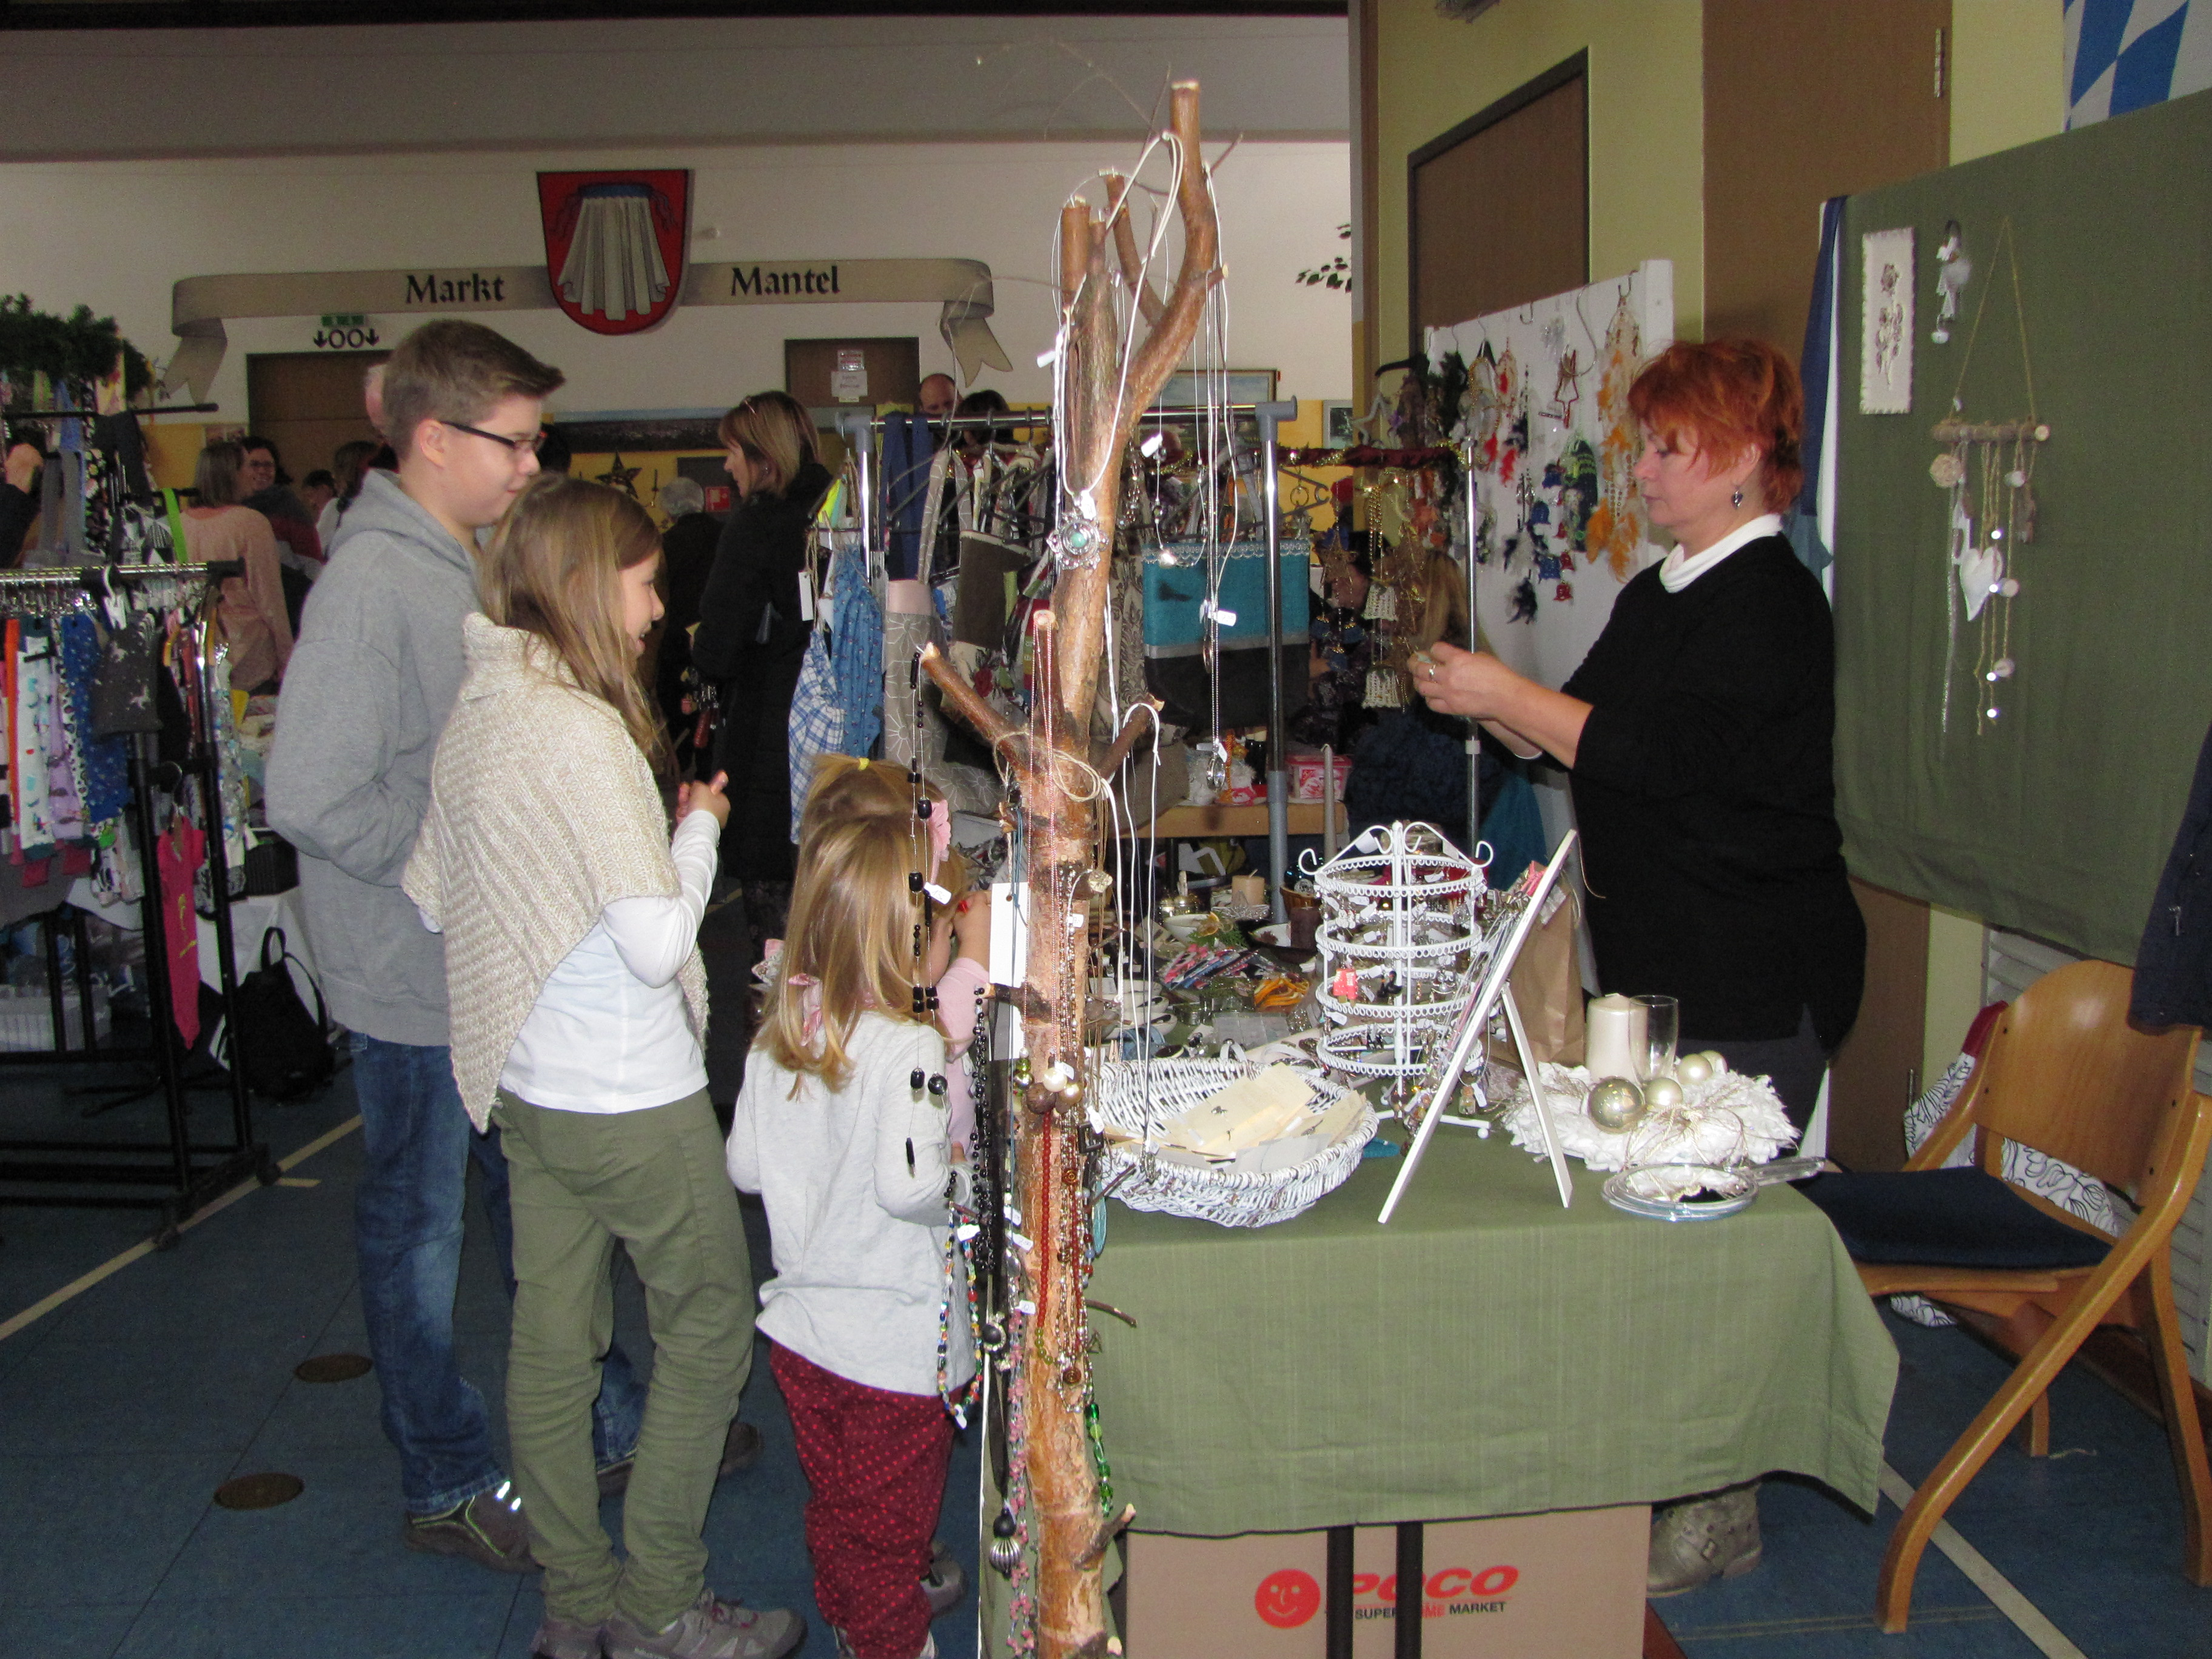 Vielseitiges Angebot bei Manteler Hobby-Kunst-Ausstellung